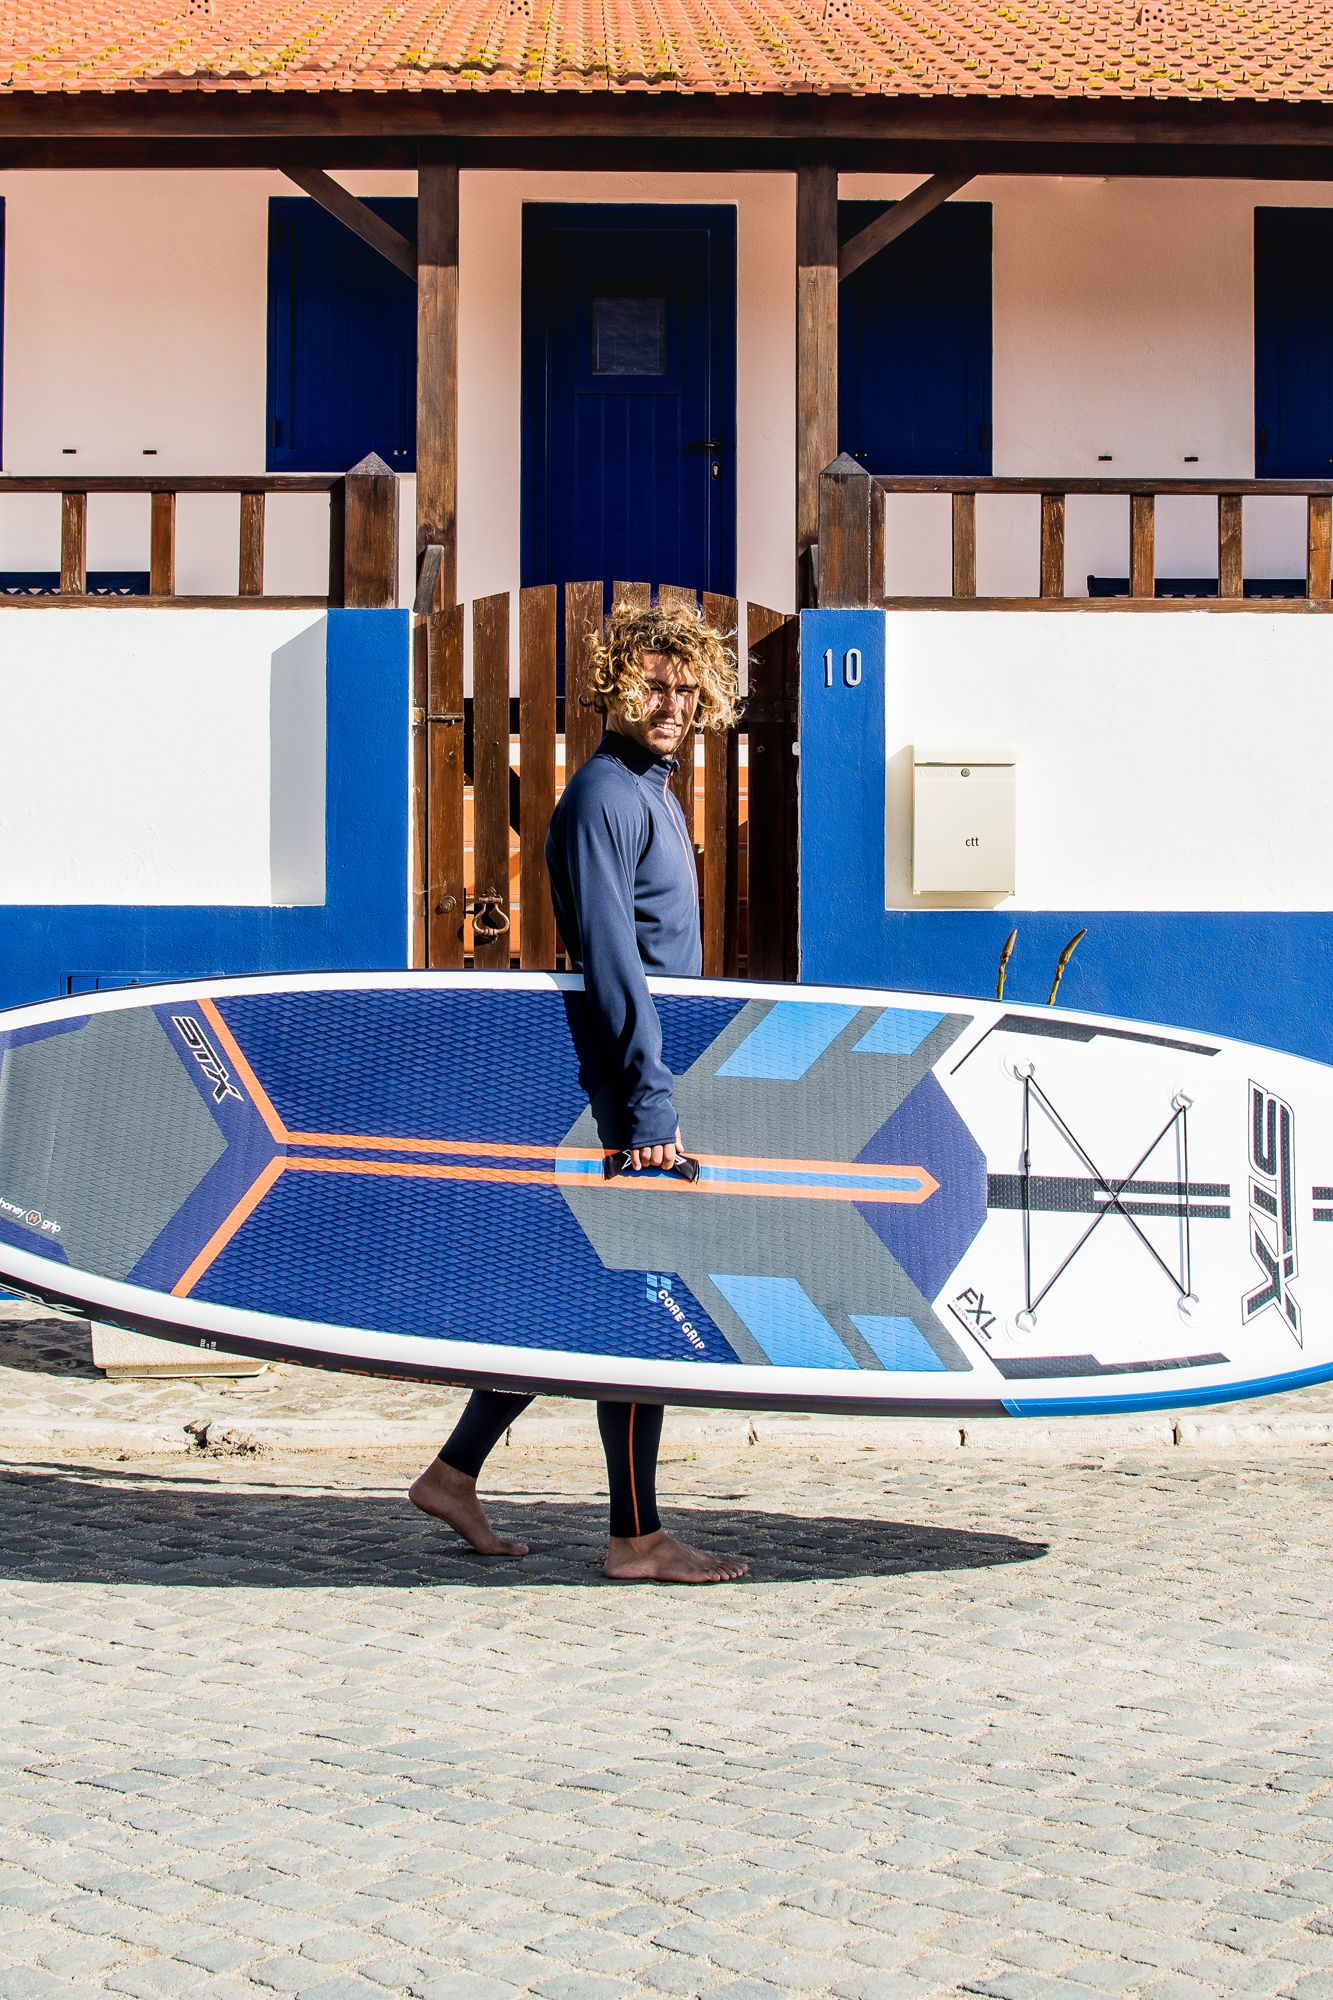 STX SUP Board - Freeride 10.6